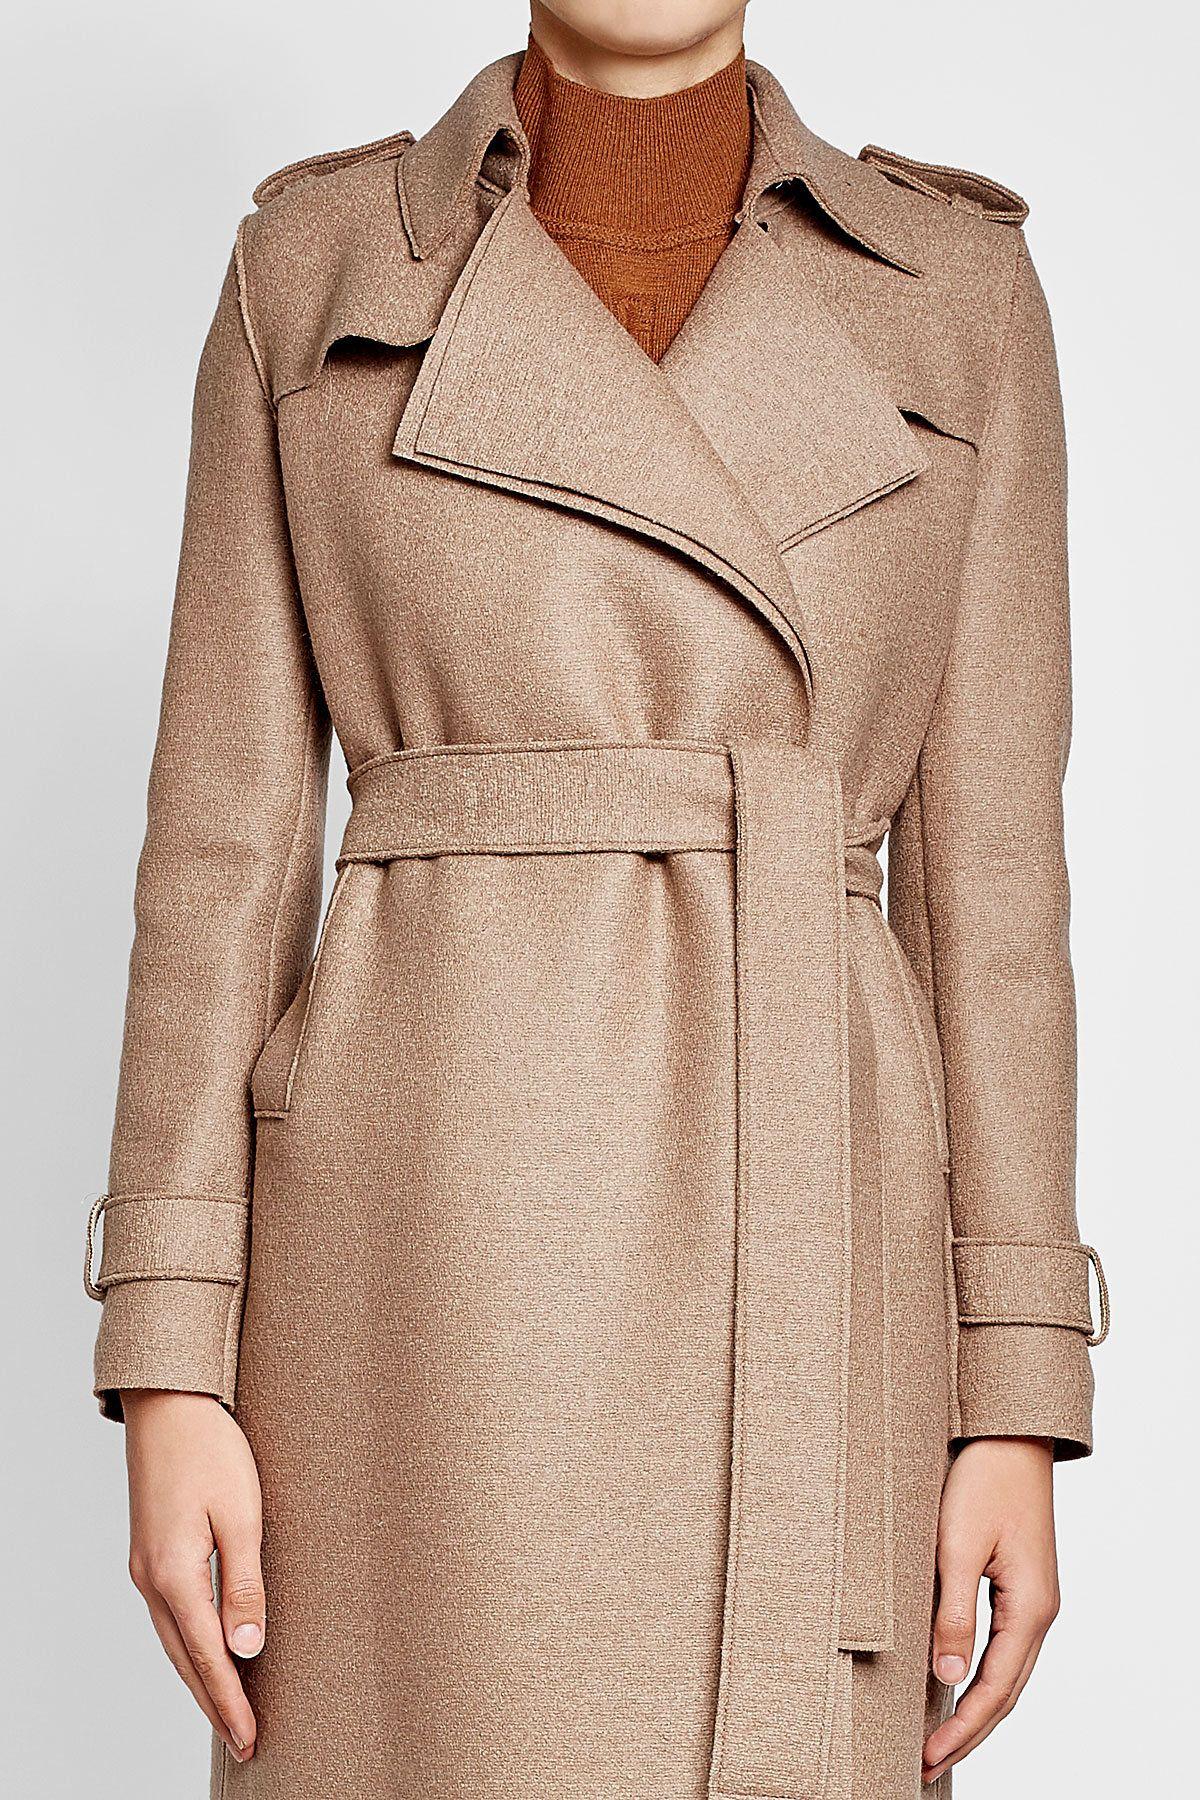 Virgin Wool Coat - Harris Wharf London | WOMEN | GB STYLEBOP.COM